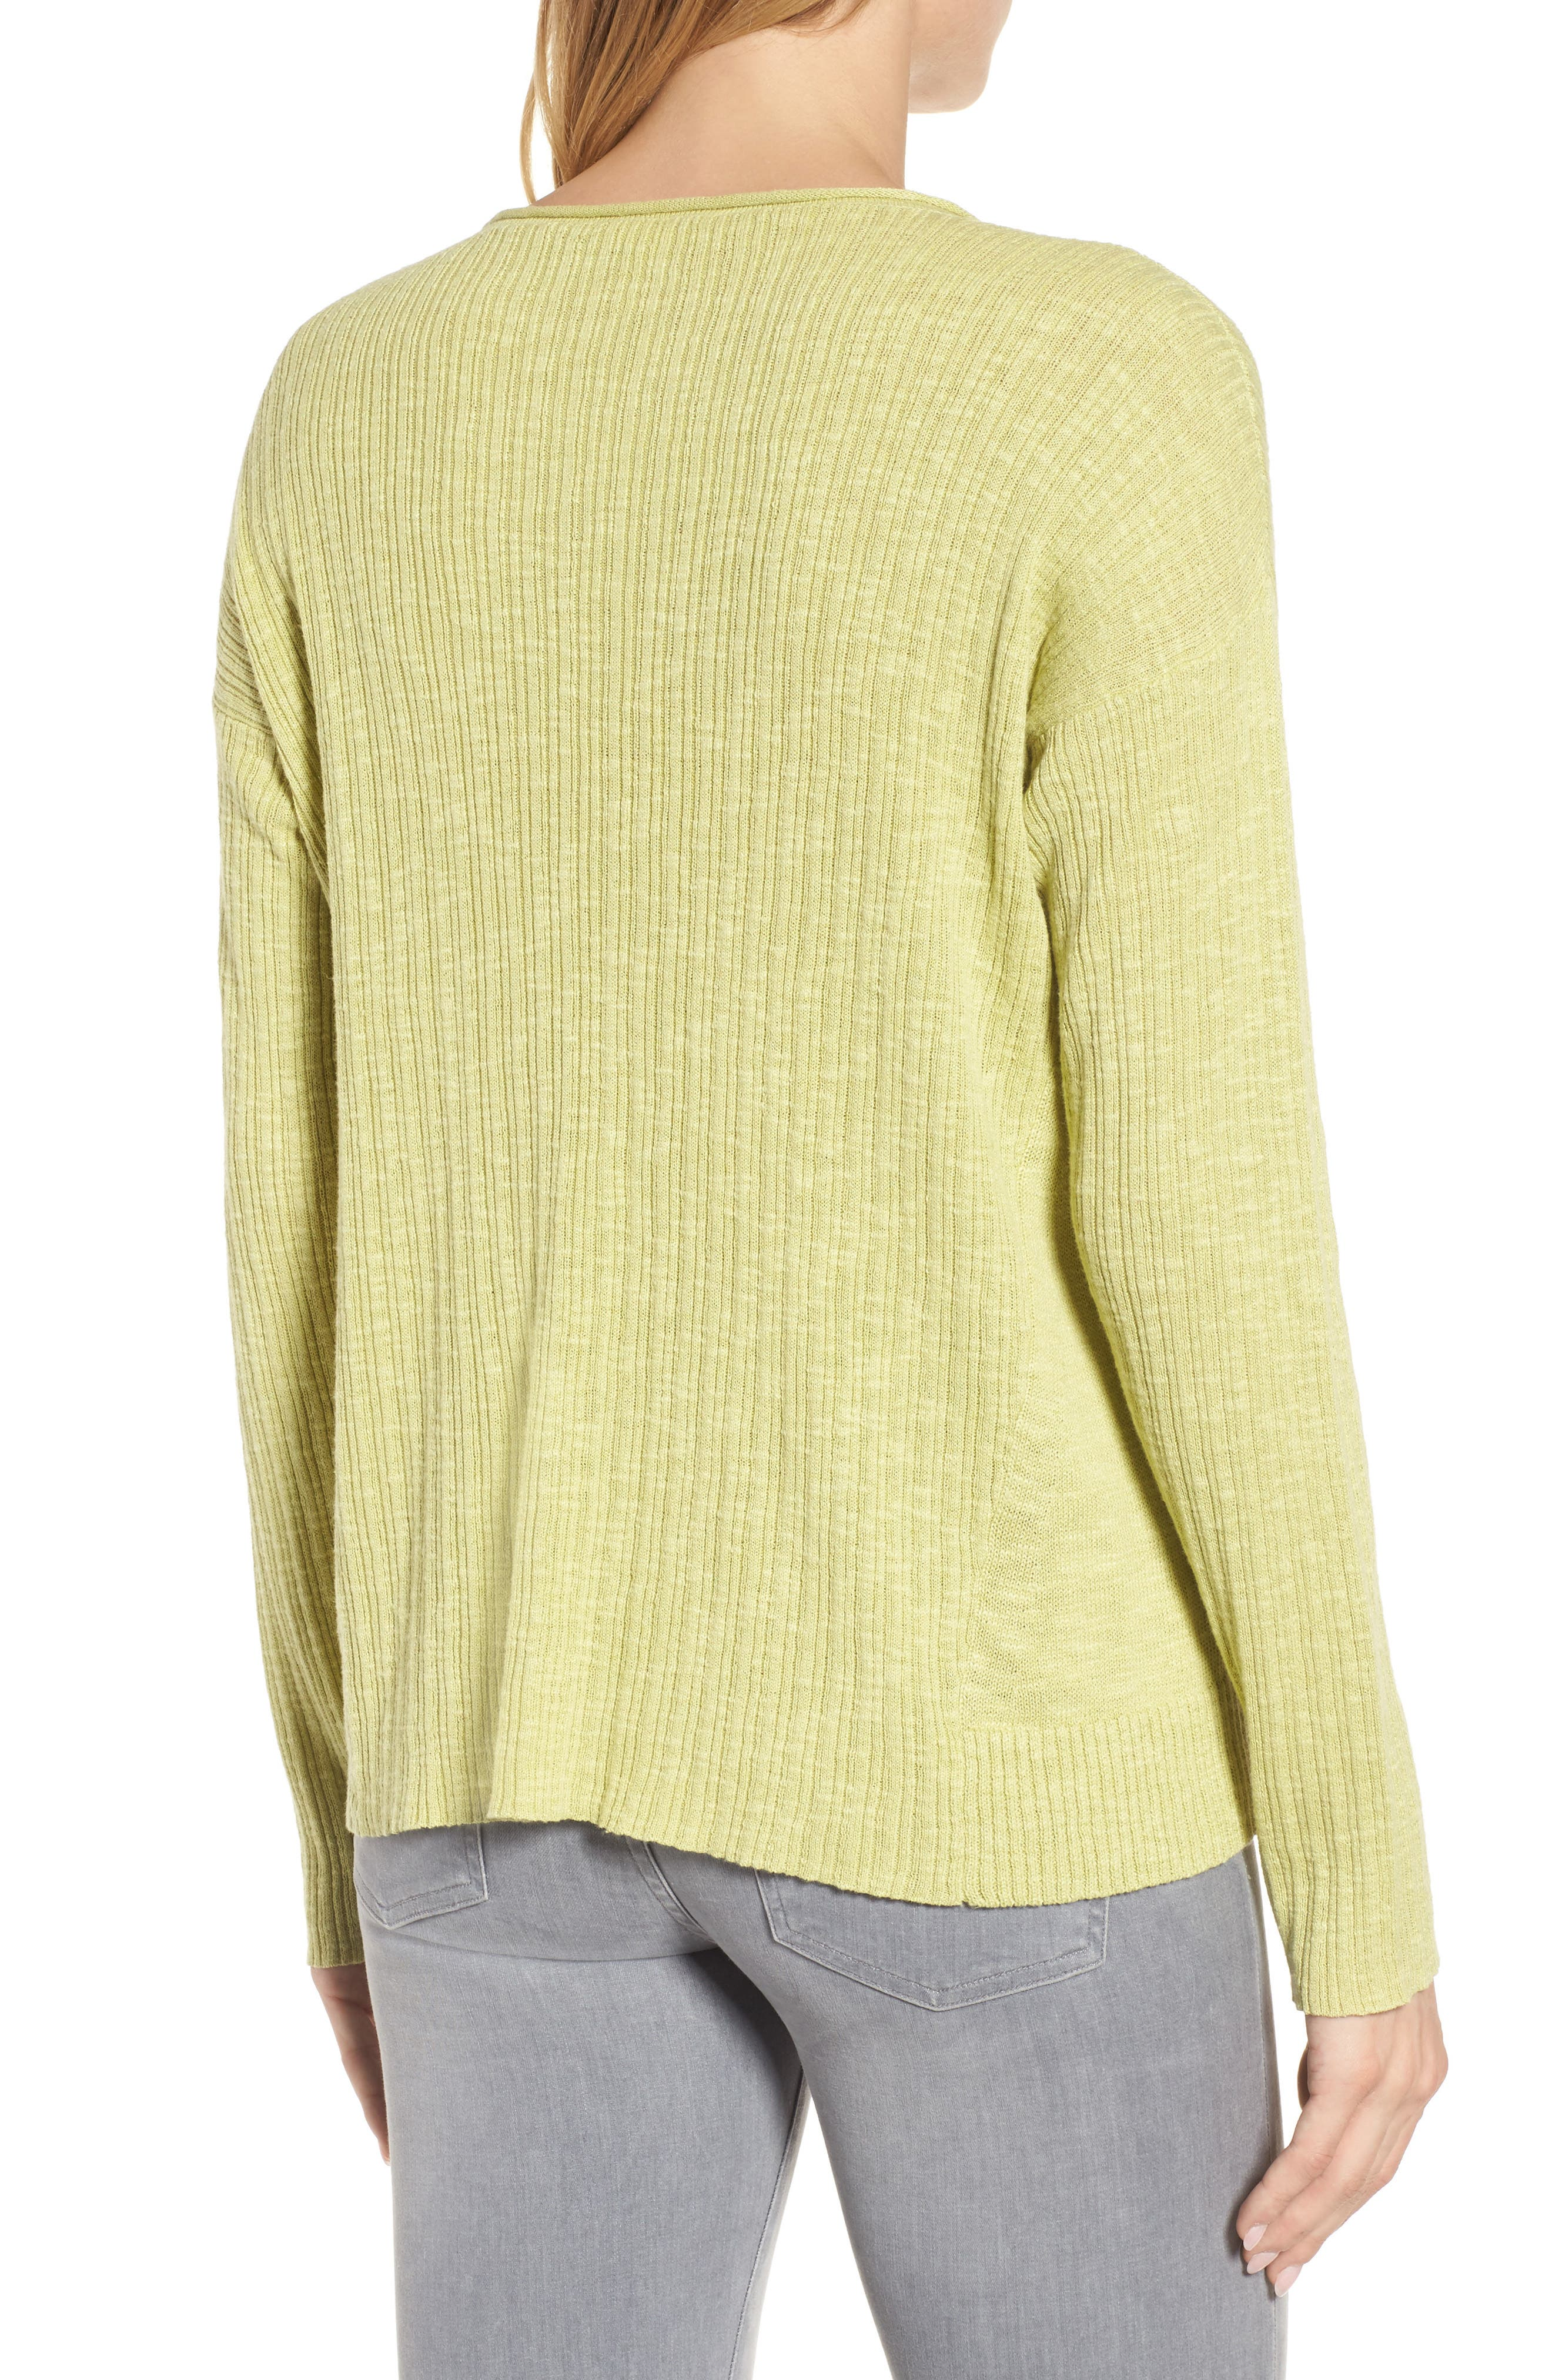 Organic Linen & Cotton Crewneck Sweater,                             Alternate thumbnail 9, color,